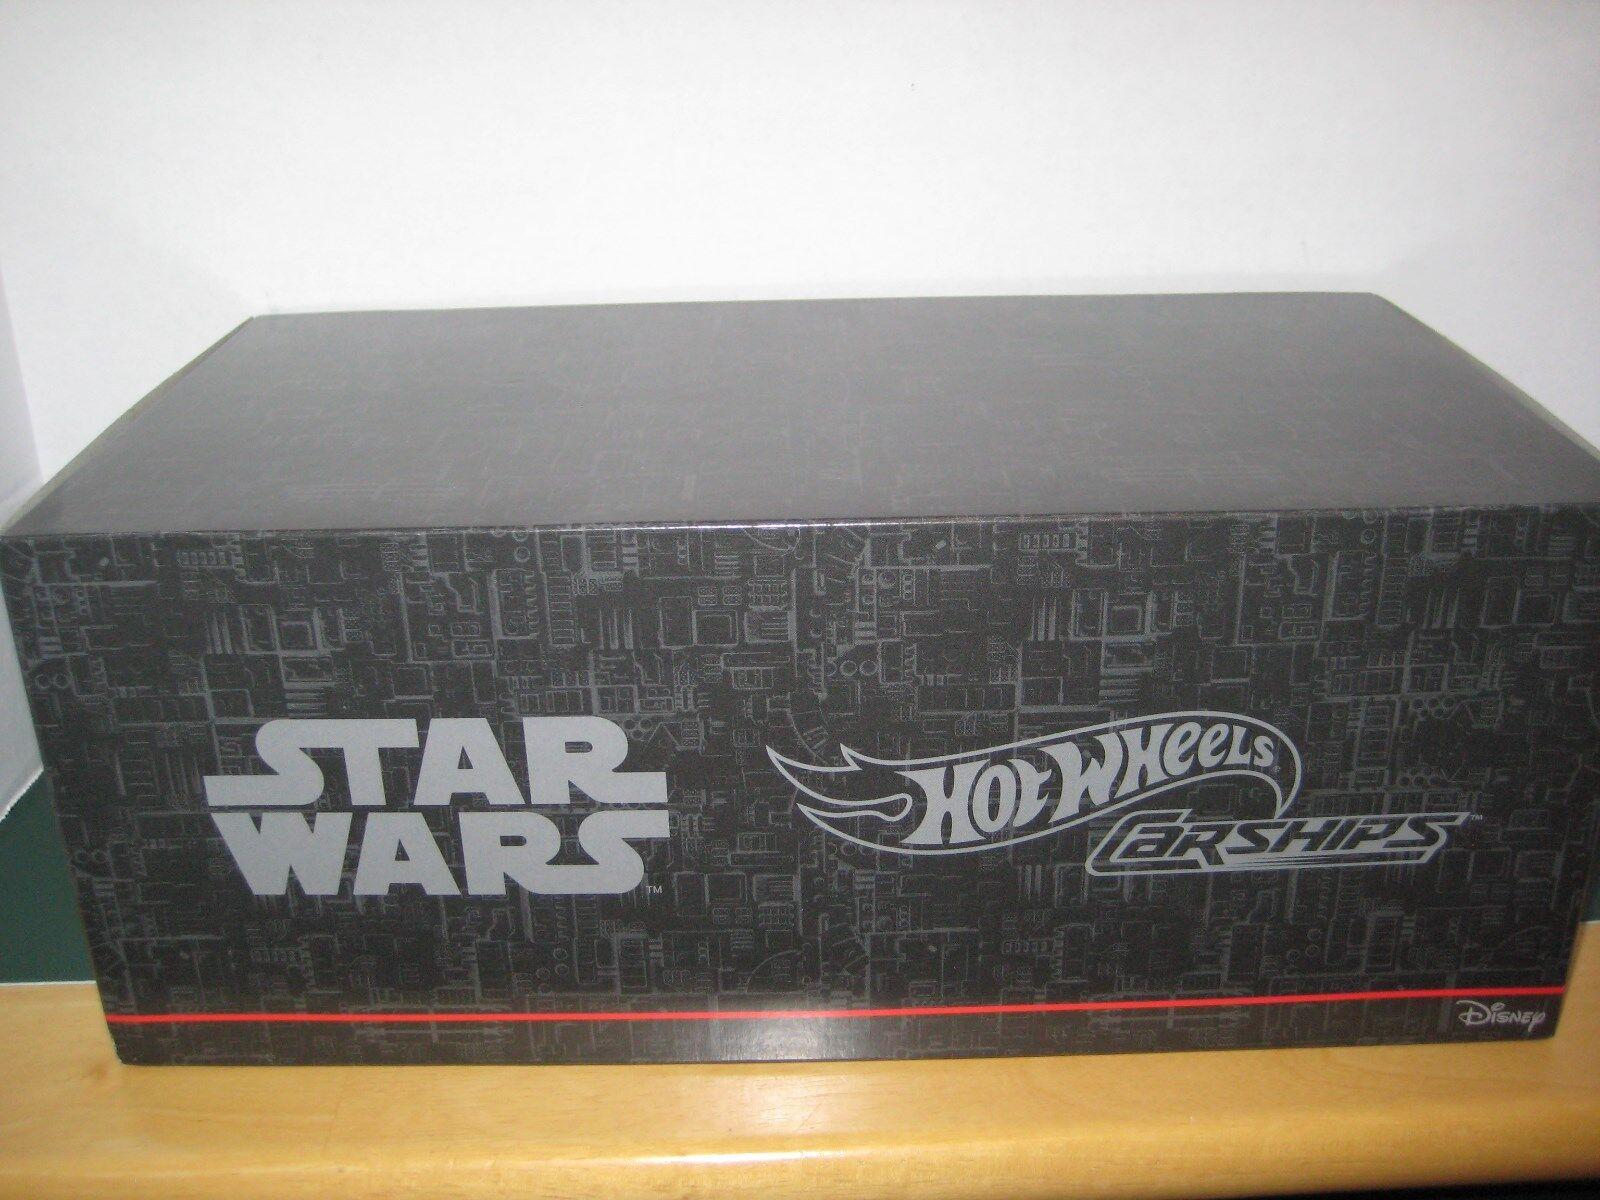 Star Wars 2016 Comic Con Hot Wheels Star Wars 4 Pack trinchera ejecutar Luces, Sonidos